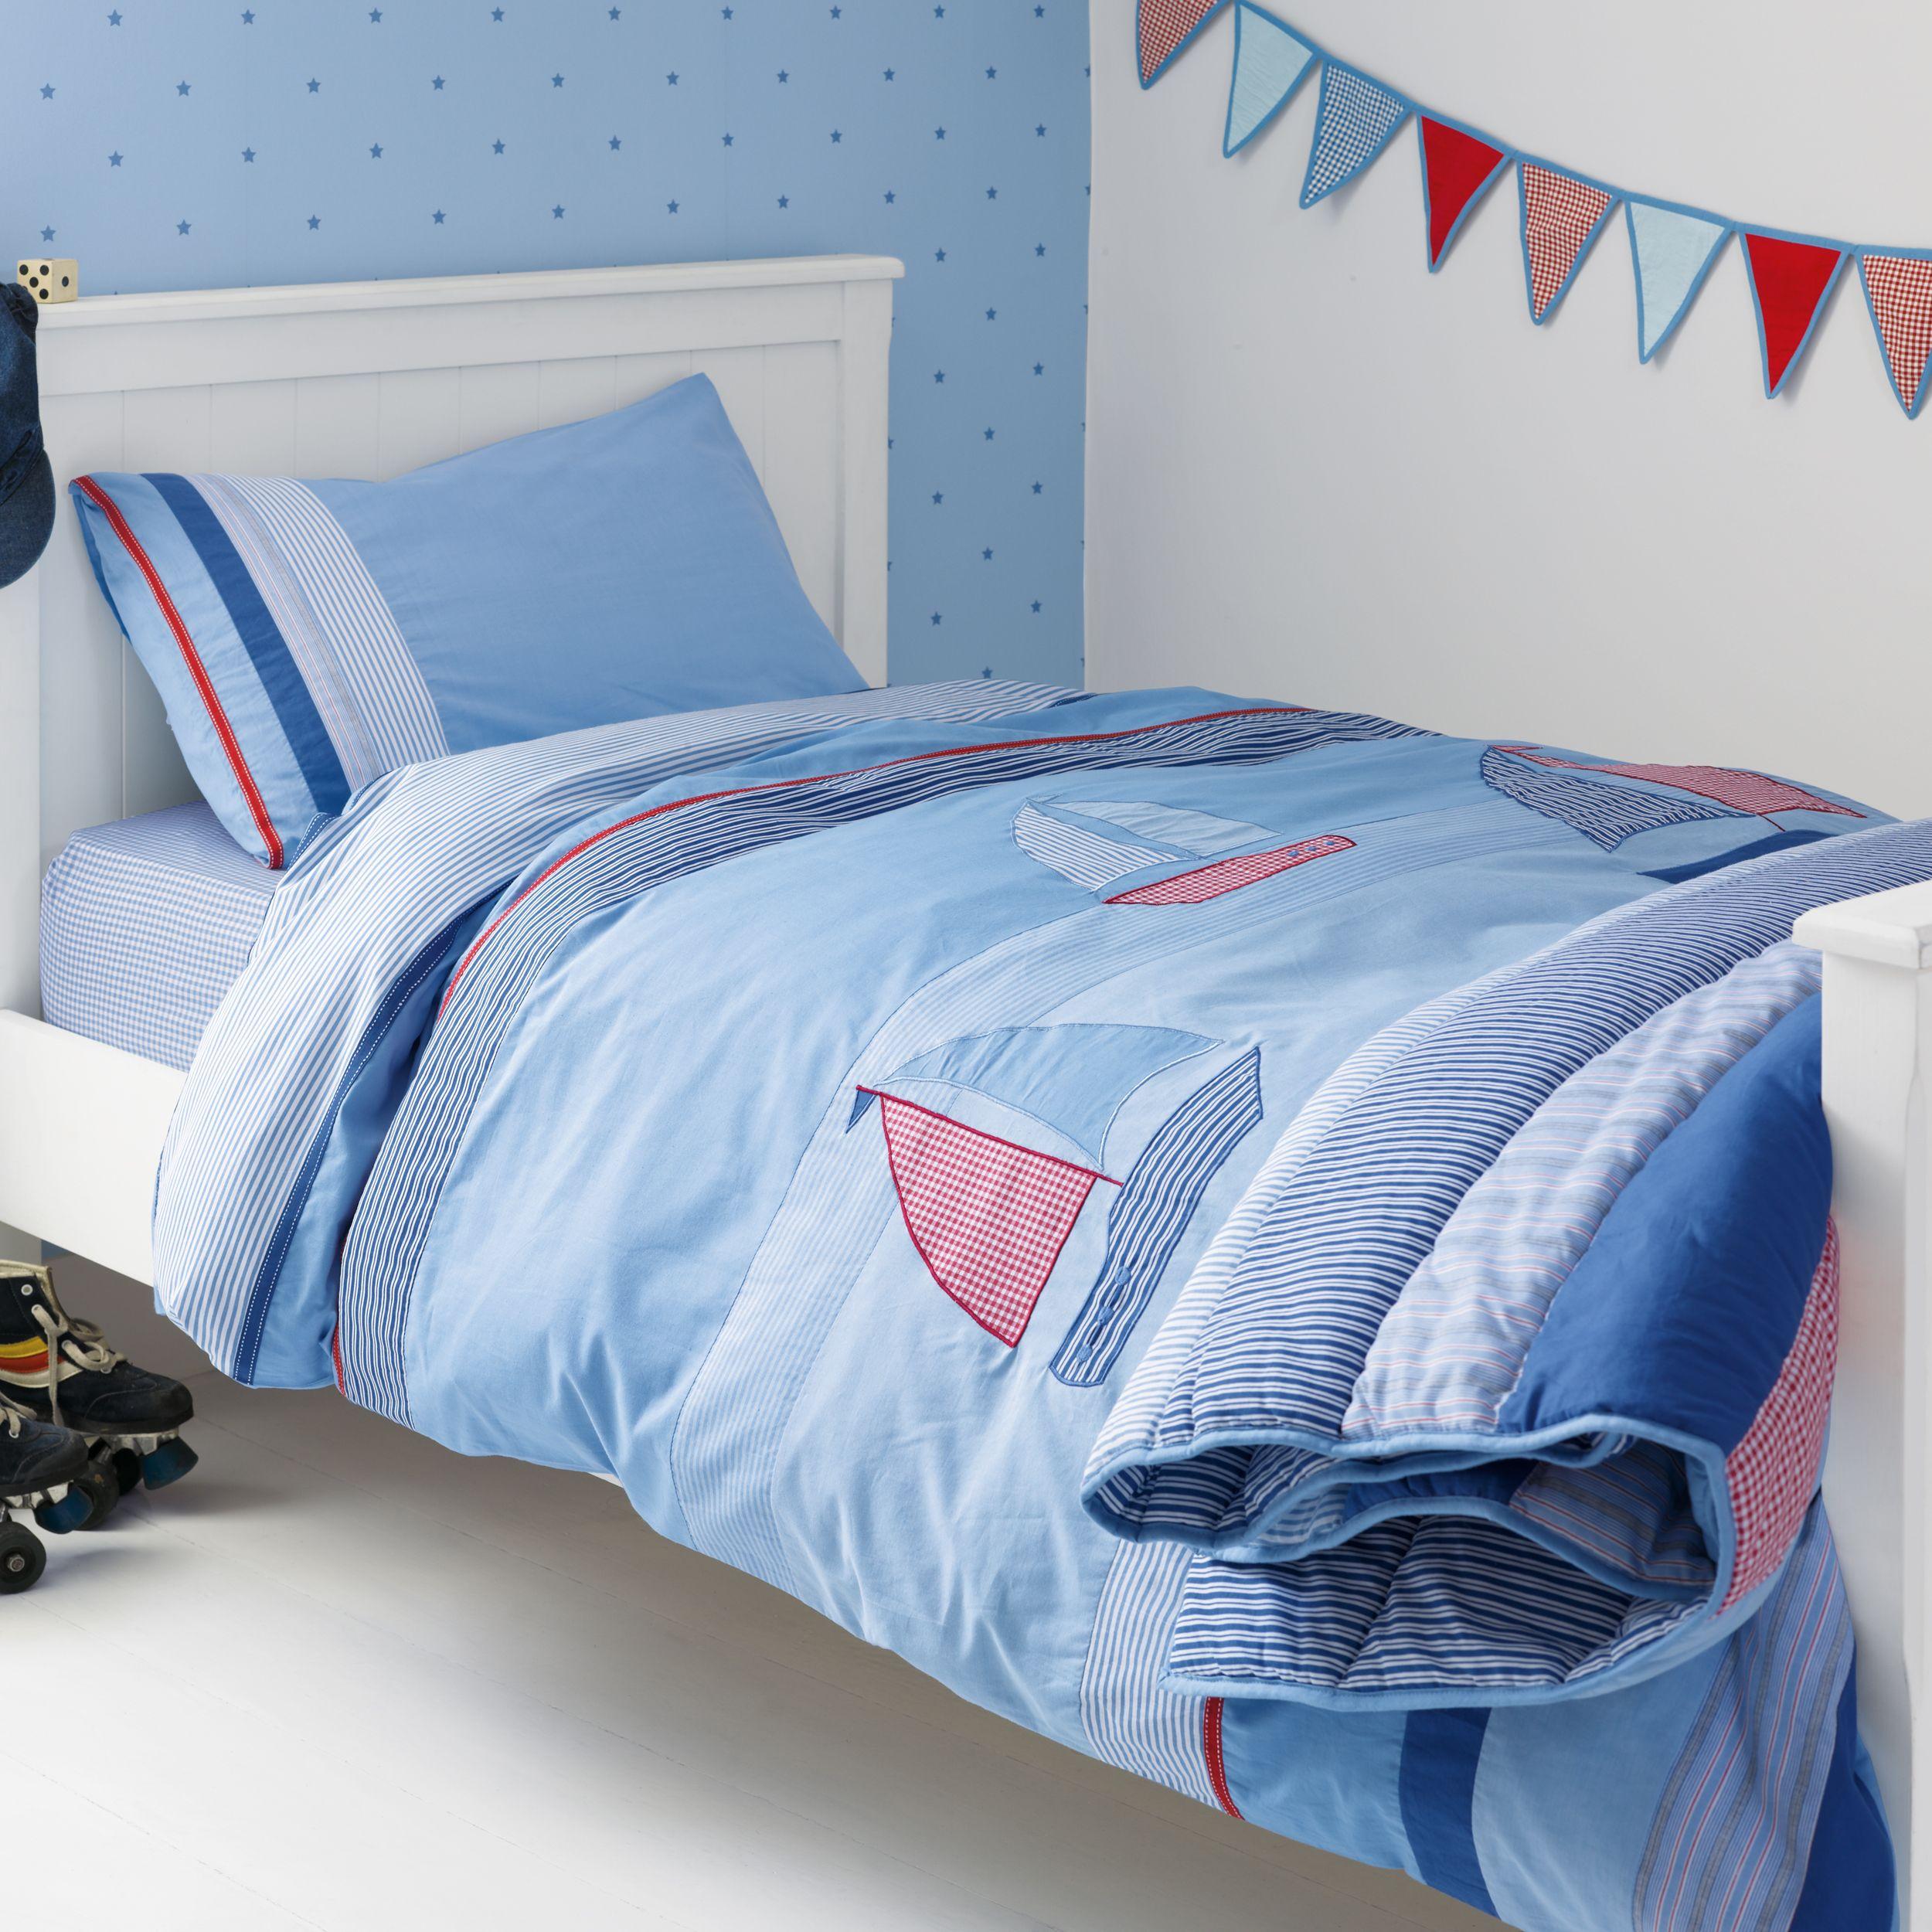 Kids Room On The Sea Cotton Duvet Set